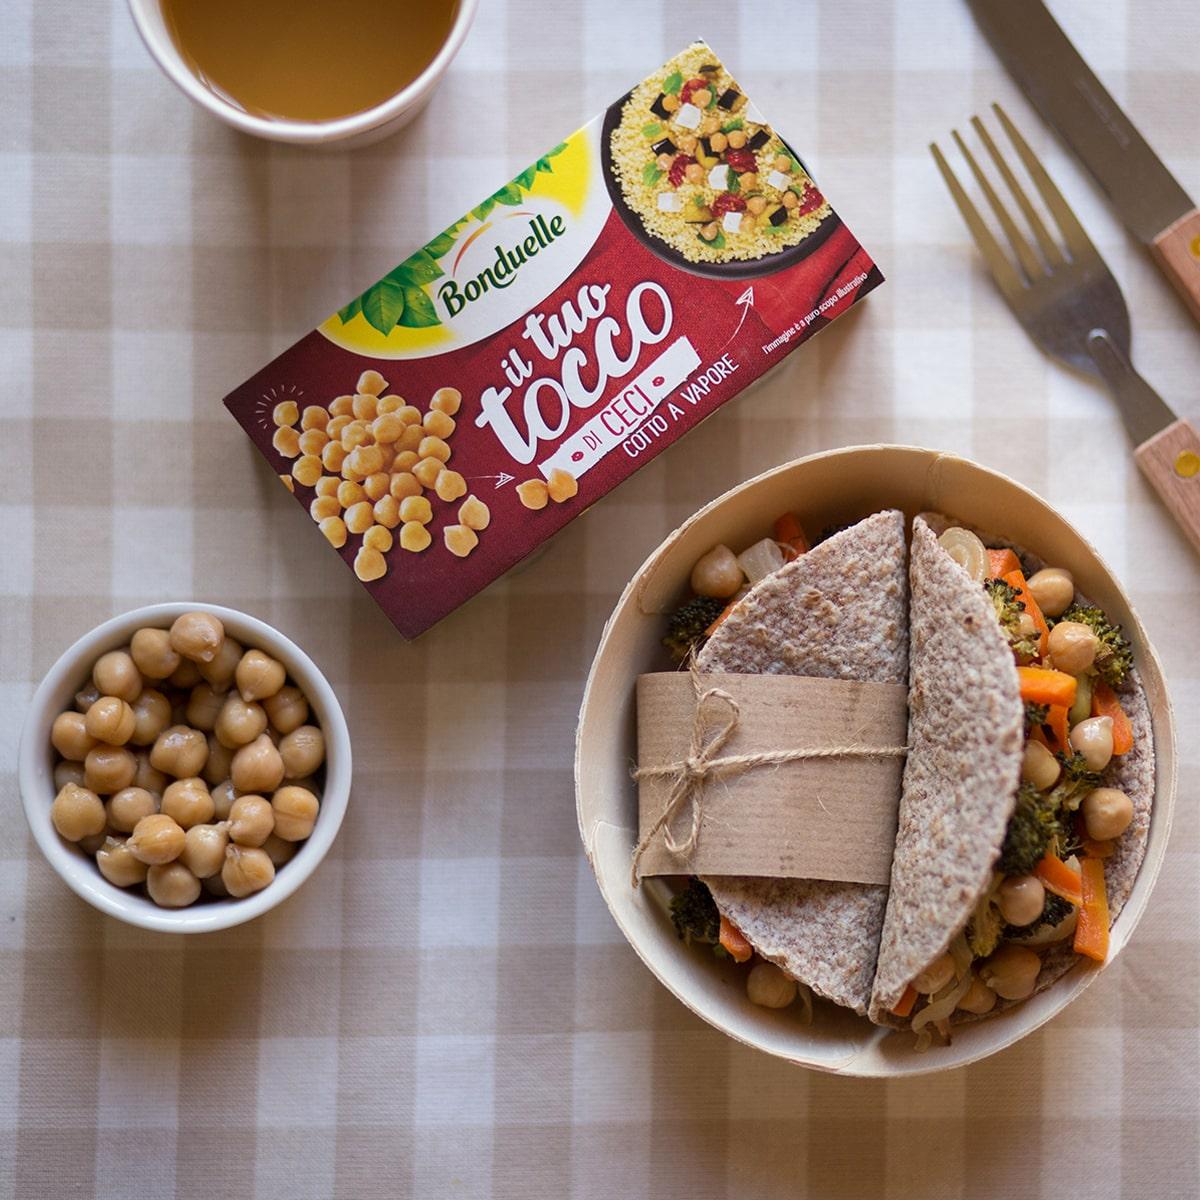 Idee pranzo al sacco mini piadine integrali